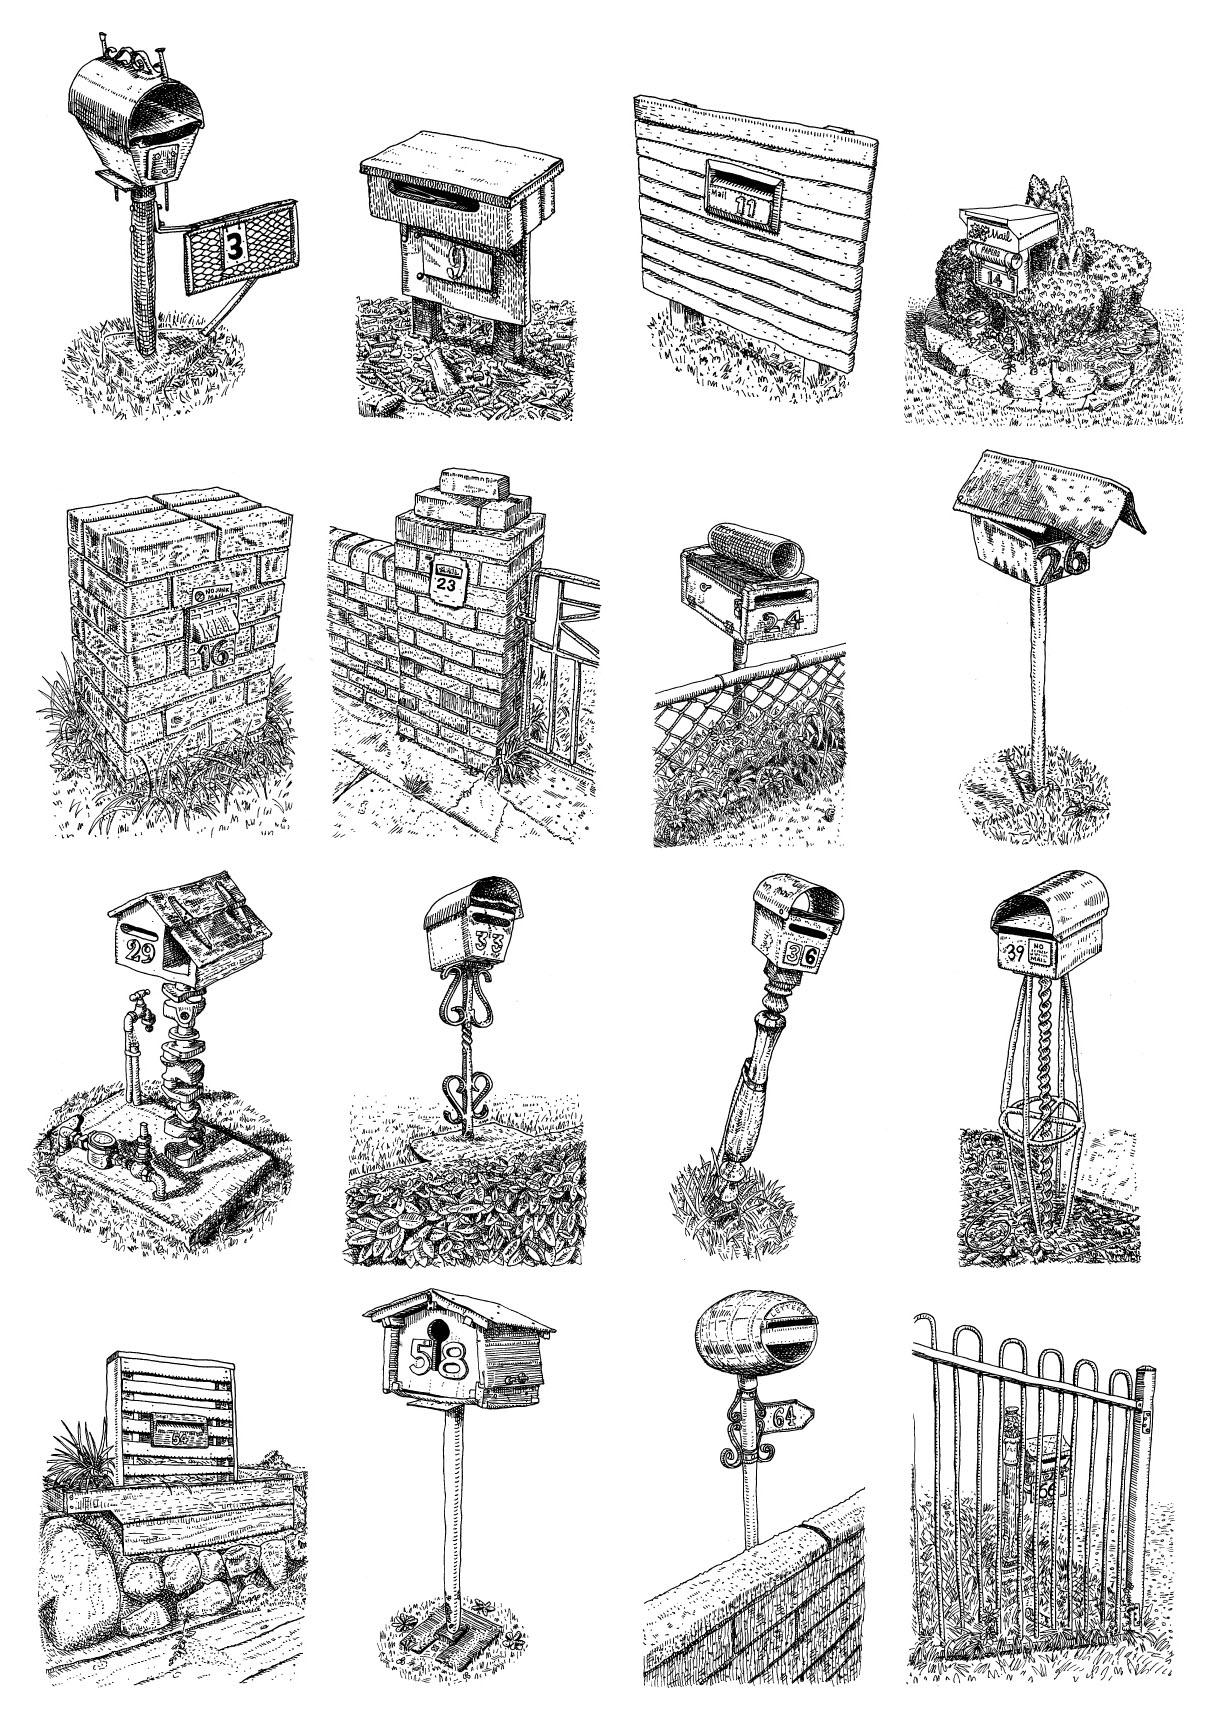 16 Postbox set 3.jpg